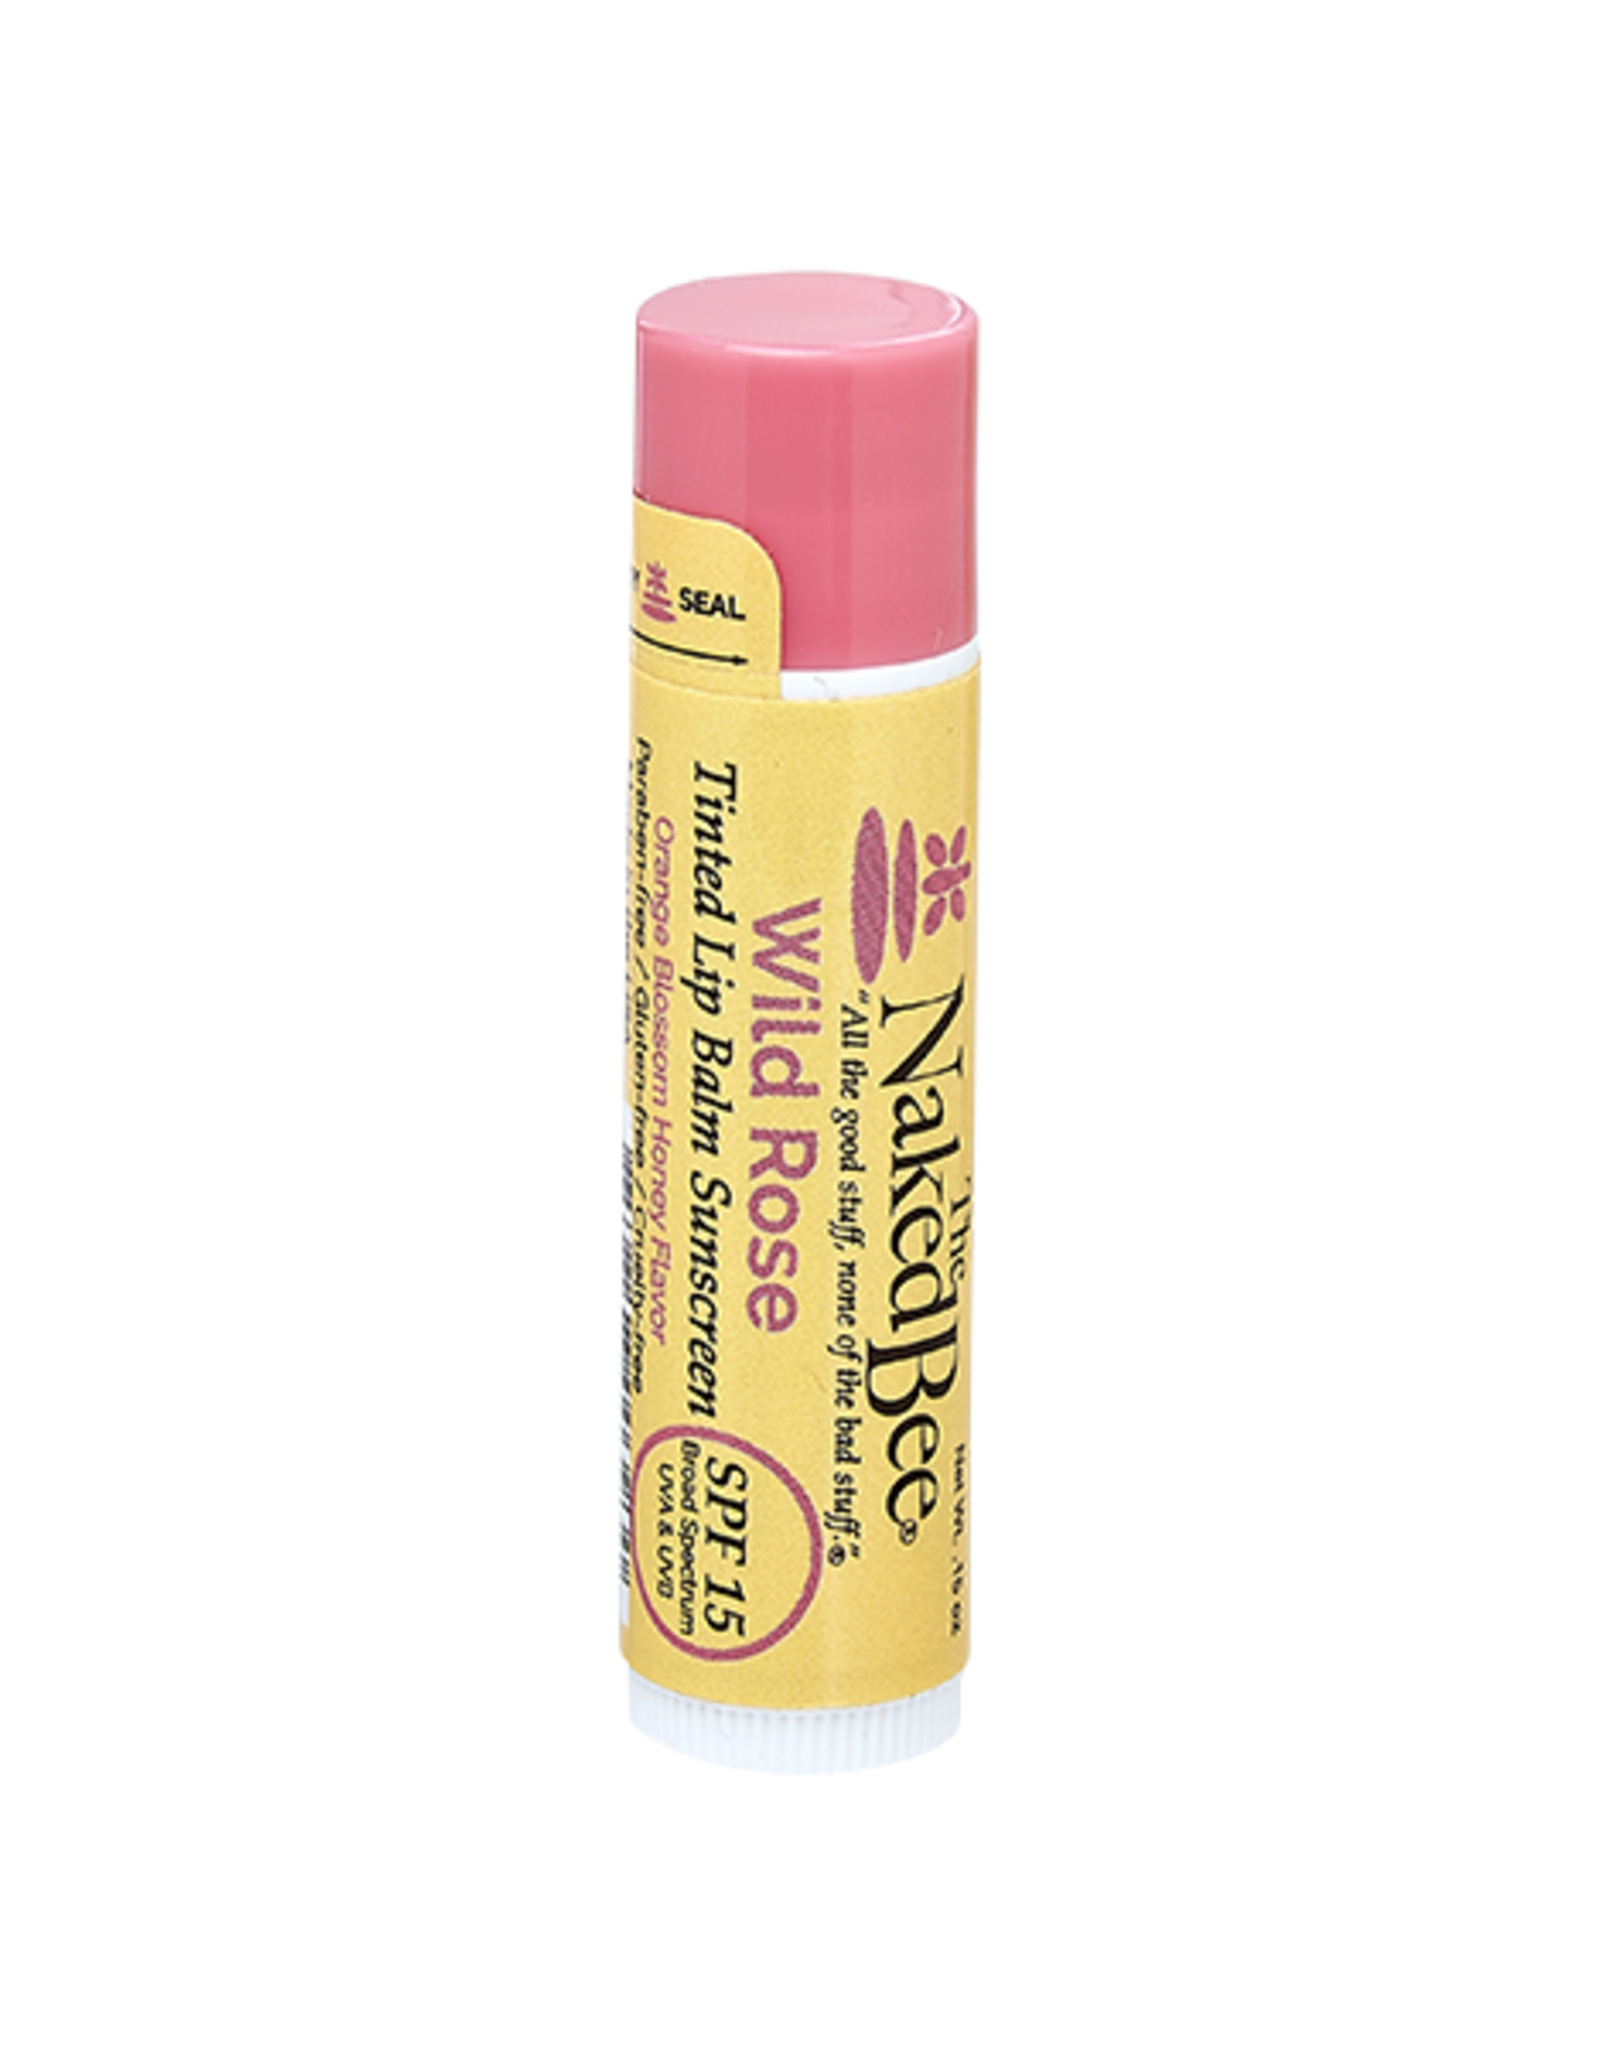 The Naked Bee The Naked Bee | Orange Blossom Honey Wild Rose SPF 15 Tinted Lip Balm